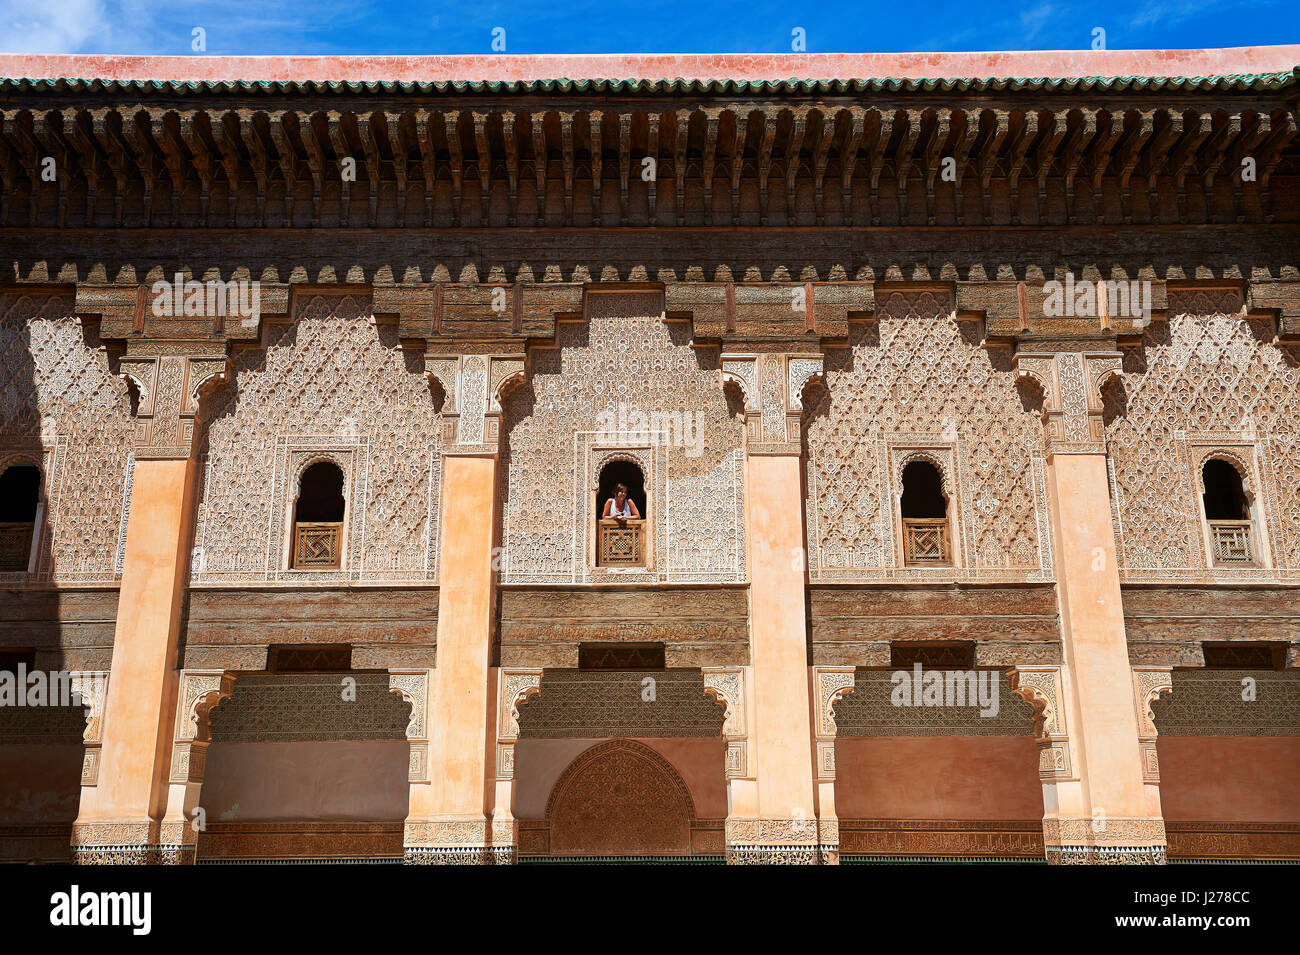 Morcabe arabesque berbère gypseries du 14e siècle Madersa Ben Youssef (Collège islamique) re-construit Photo Stock